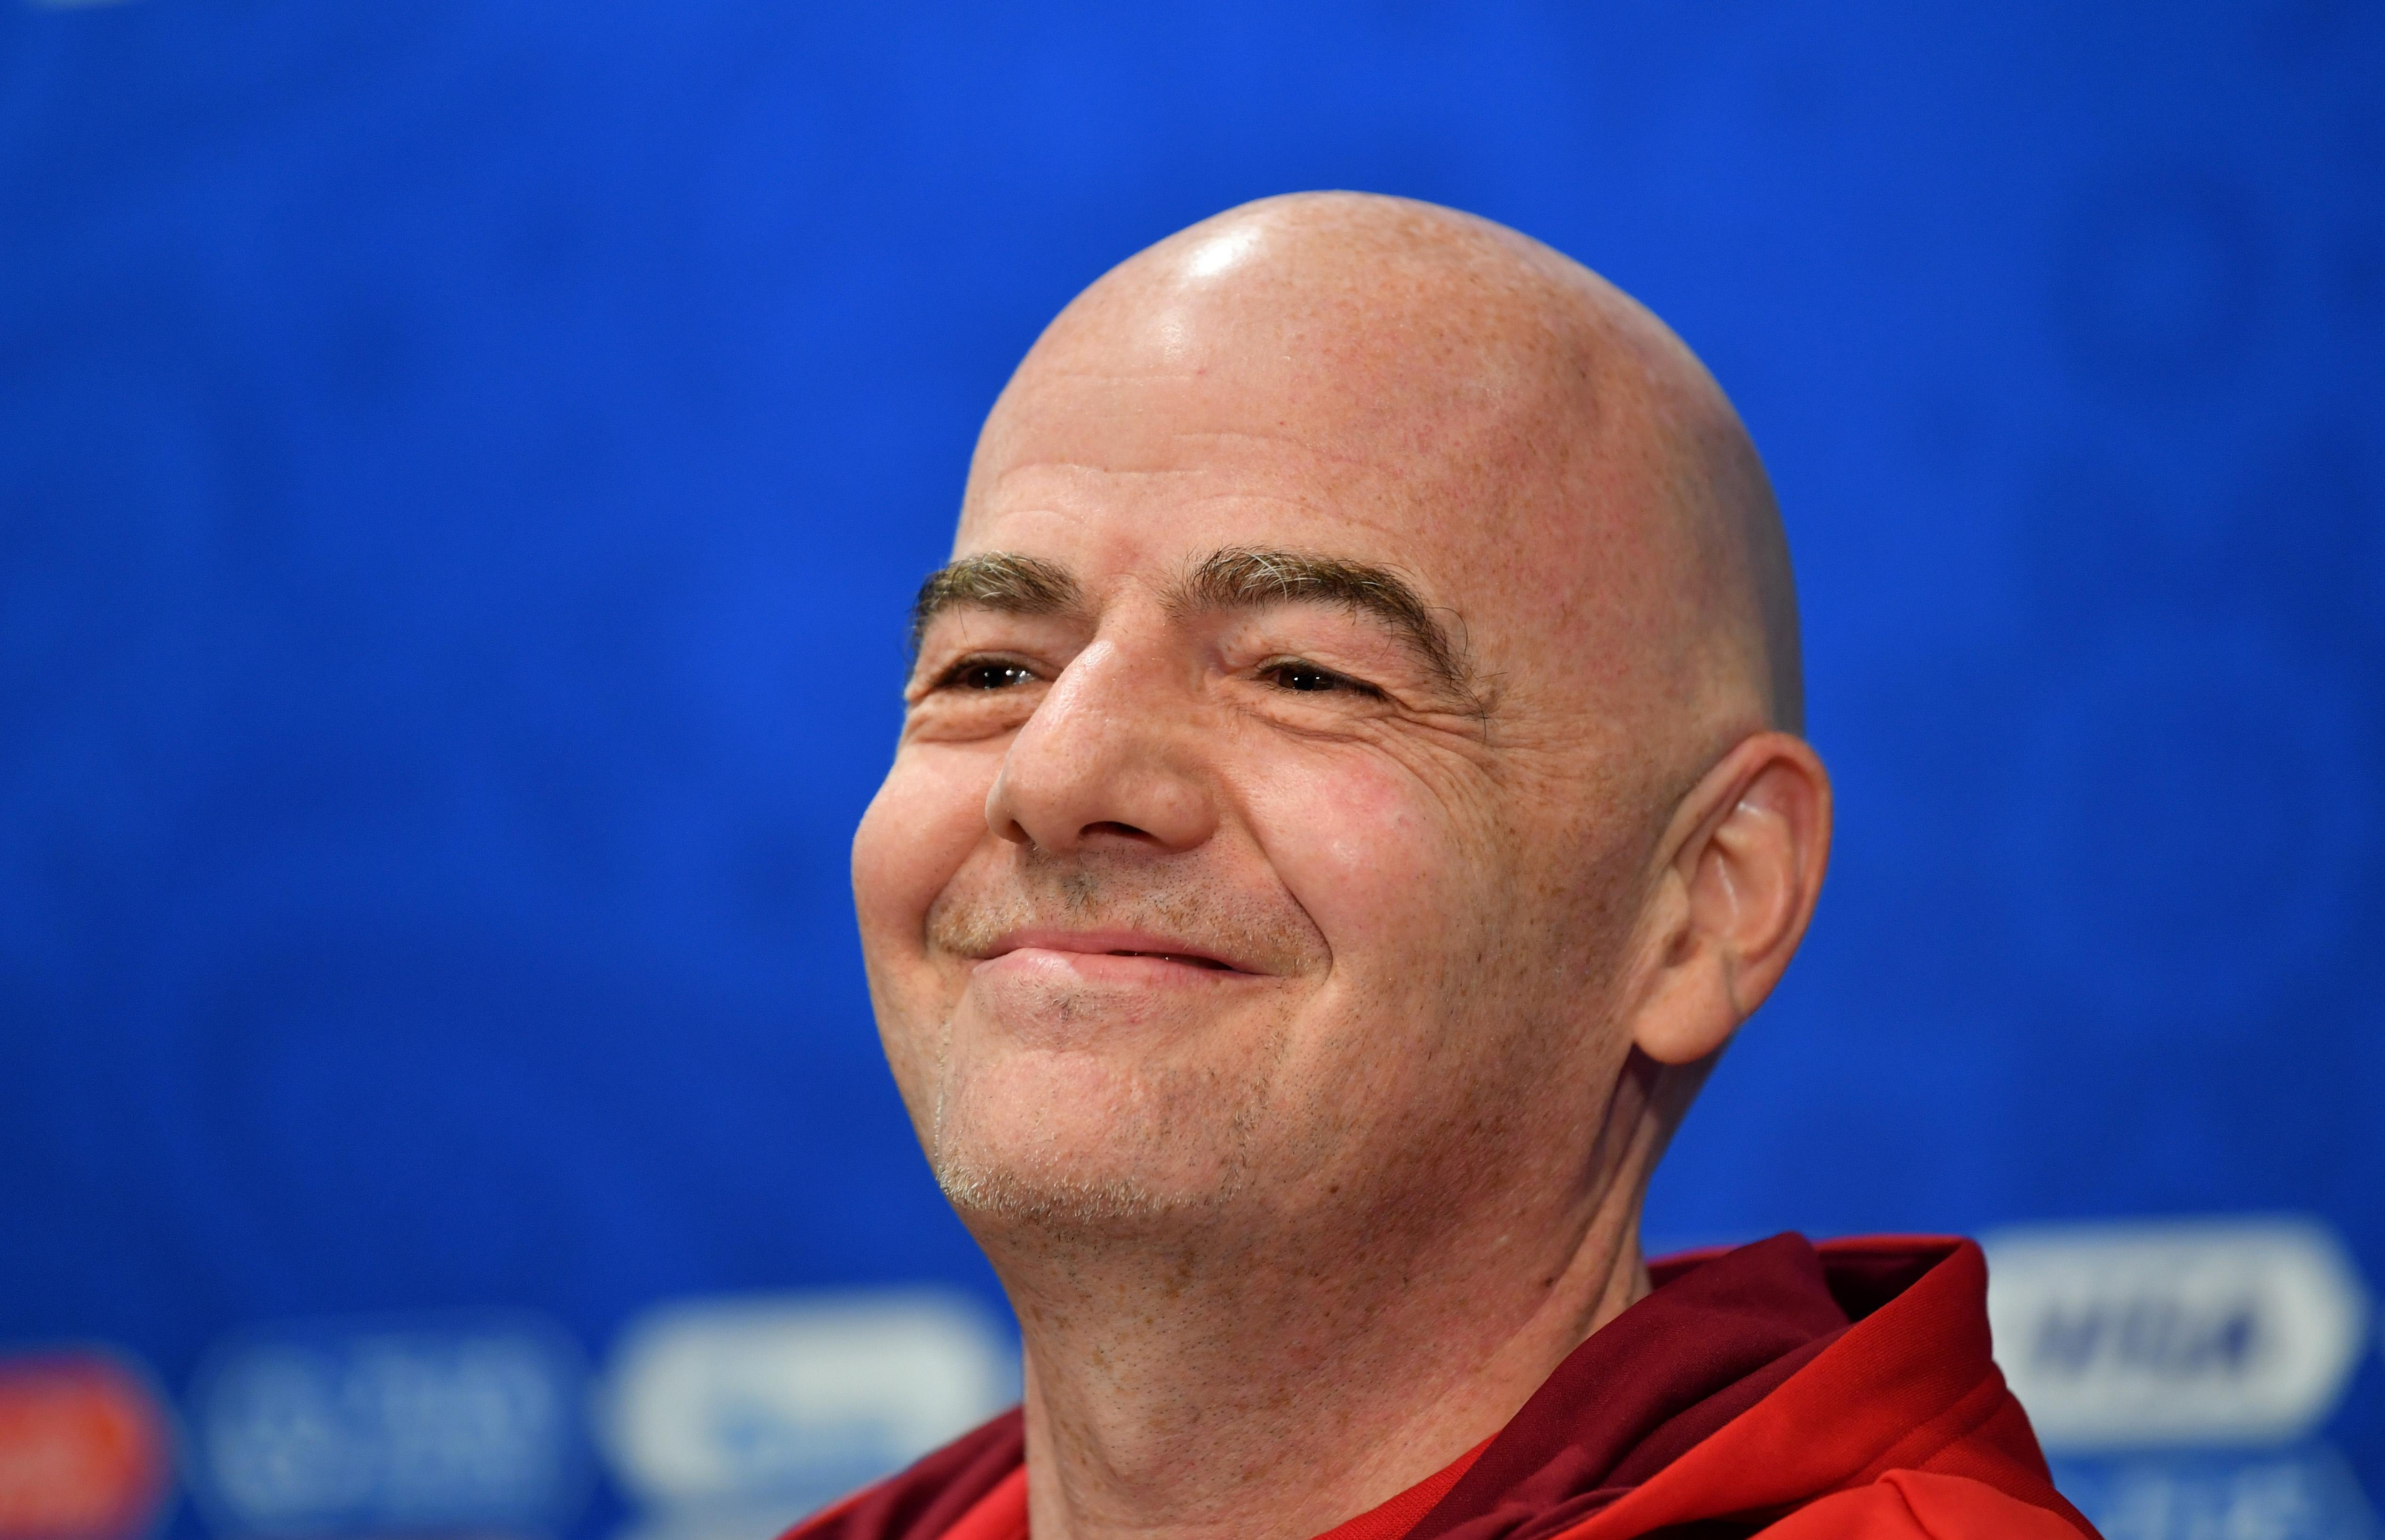 Closing Press Conference - 2018 FIFA World Cup Russia